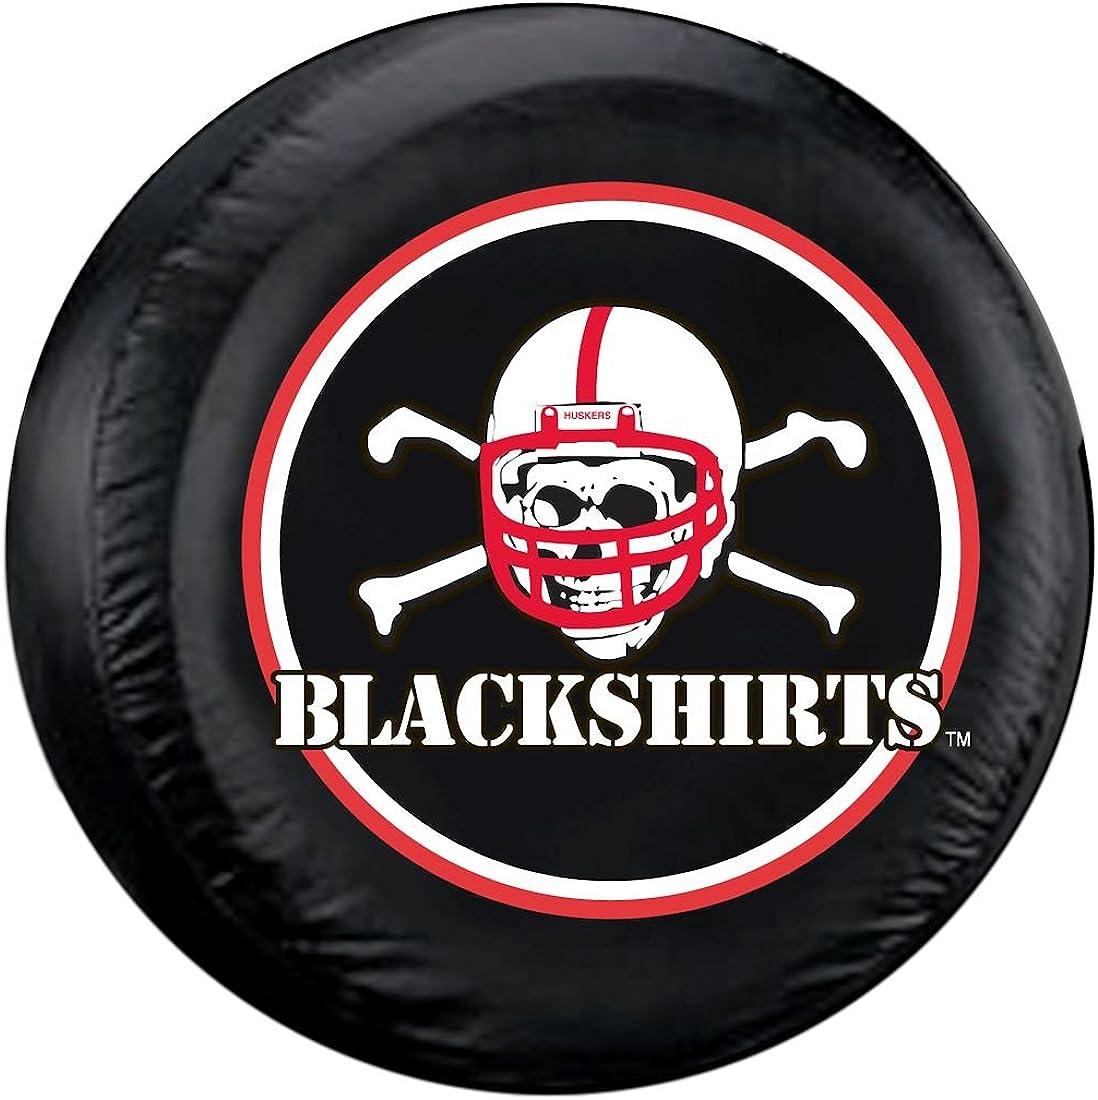 University of Nebraska Tire Cover with Cornhuskers Logo on Black Vinyl